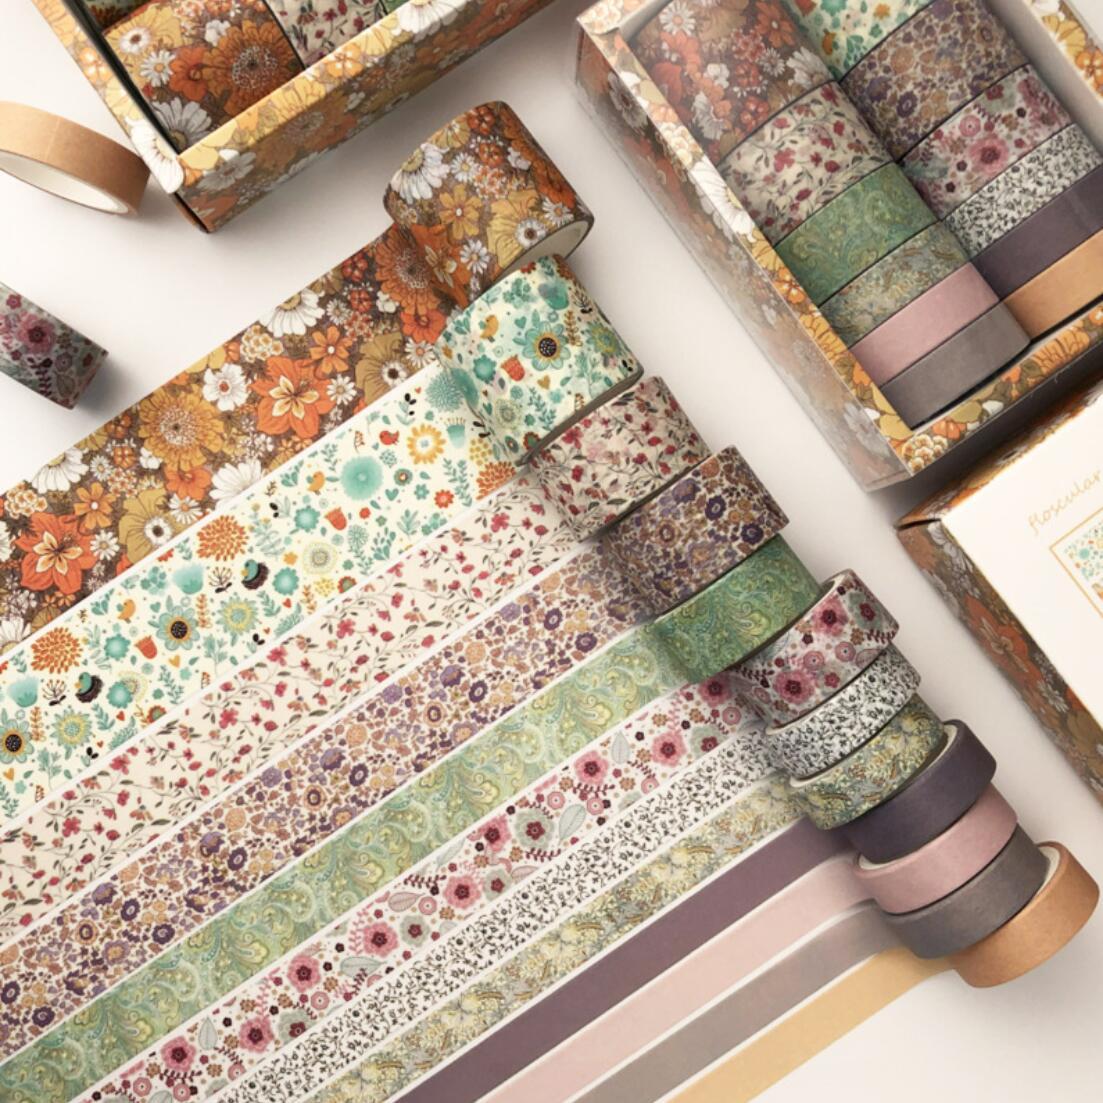 12 Pcs/set Vintage Fanstasy Flowers Washi Tape Set Scrapbooking DIY Bullet Journal Stationery Masking Tape School Office